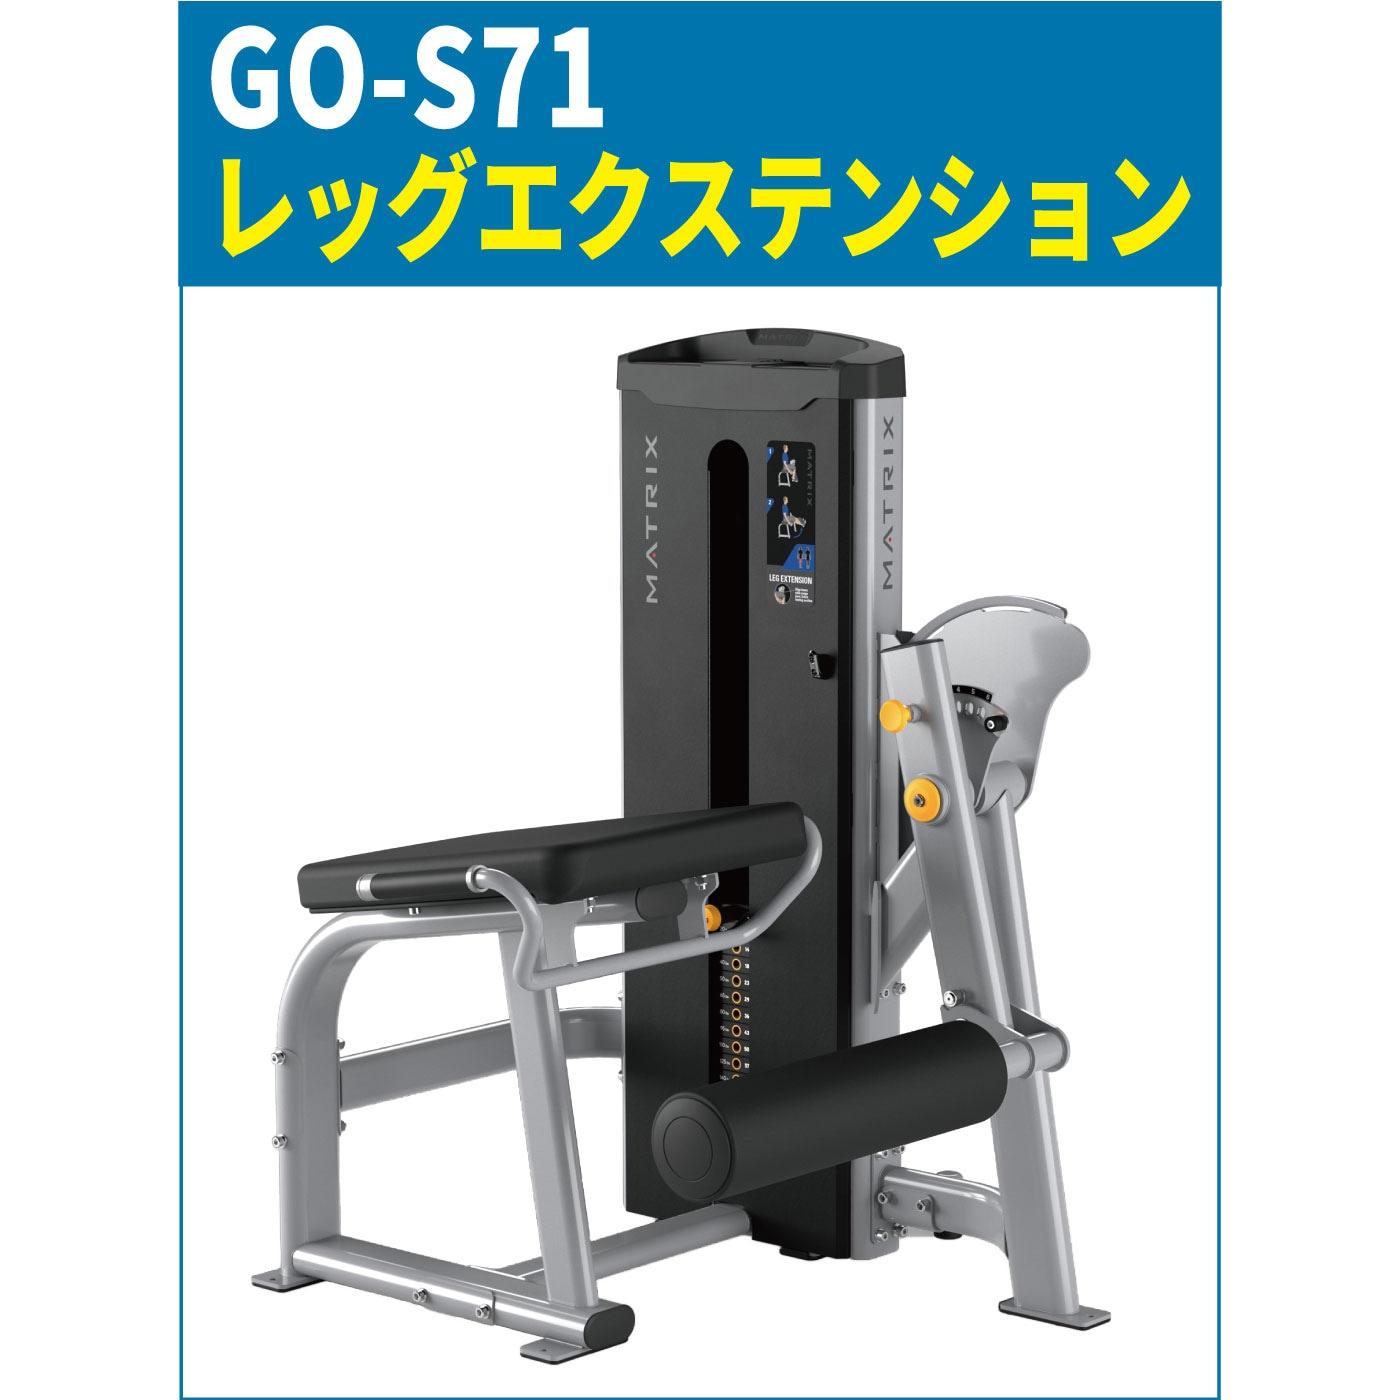 GO-S71のレッグエクステンション